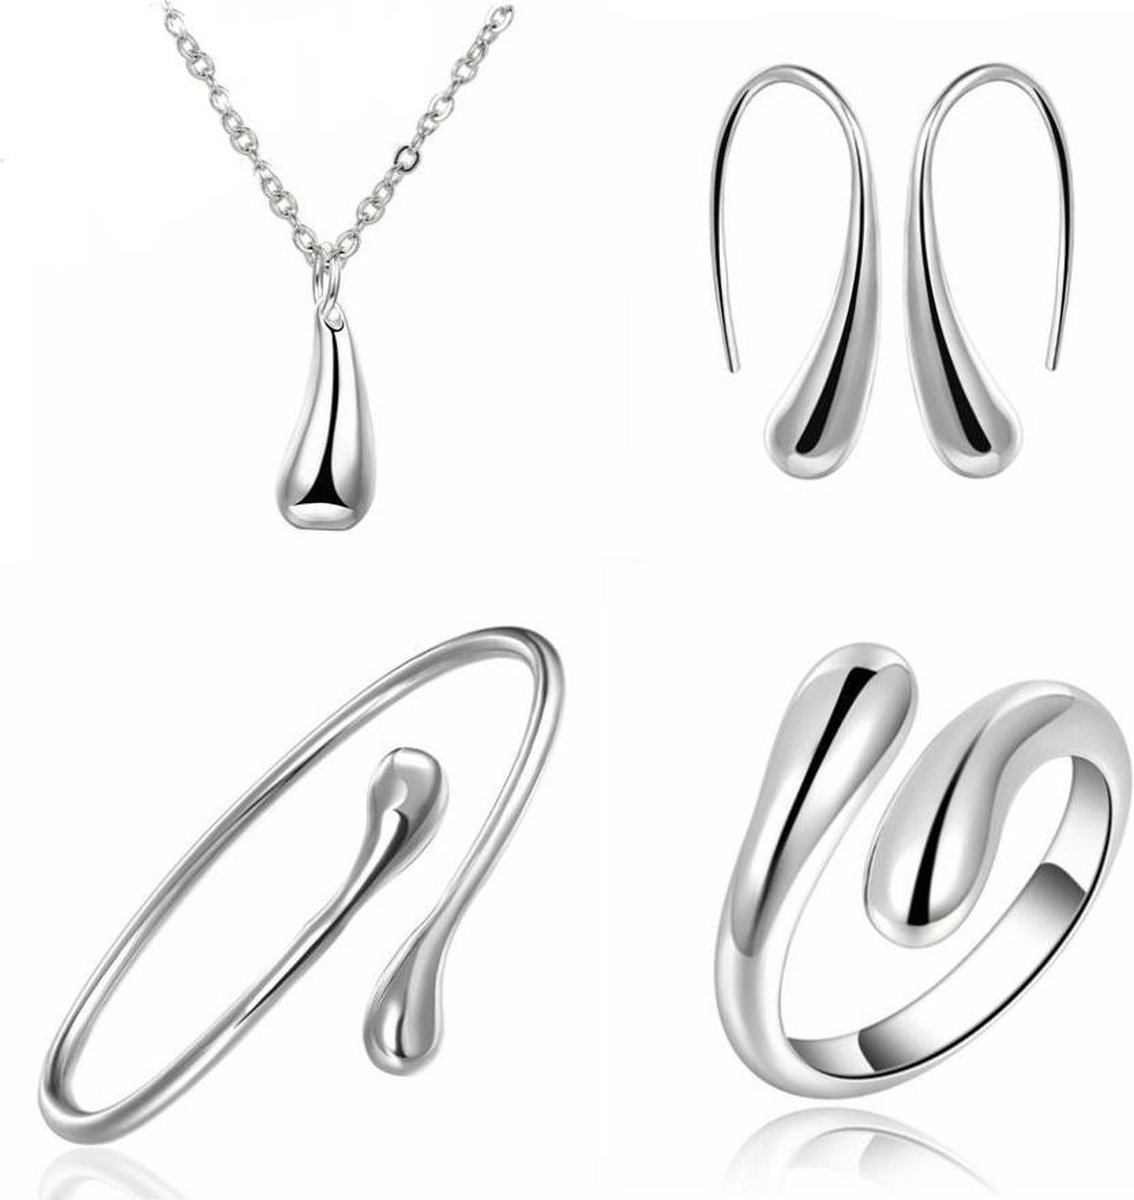 Jewelry Silver Waterdrop/Druppel Set 4-delig | 925 Zilver | Fashion Favorite - Fashion Favorite